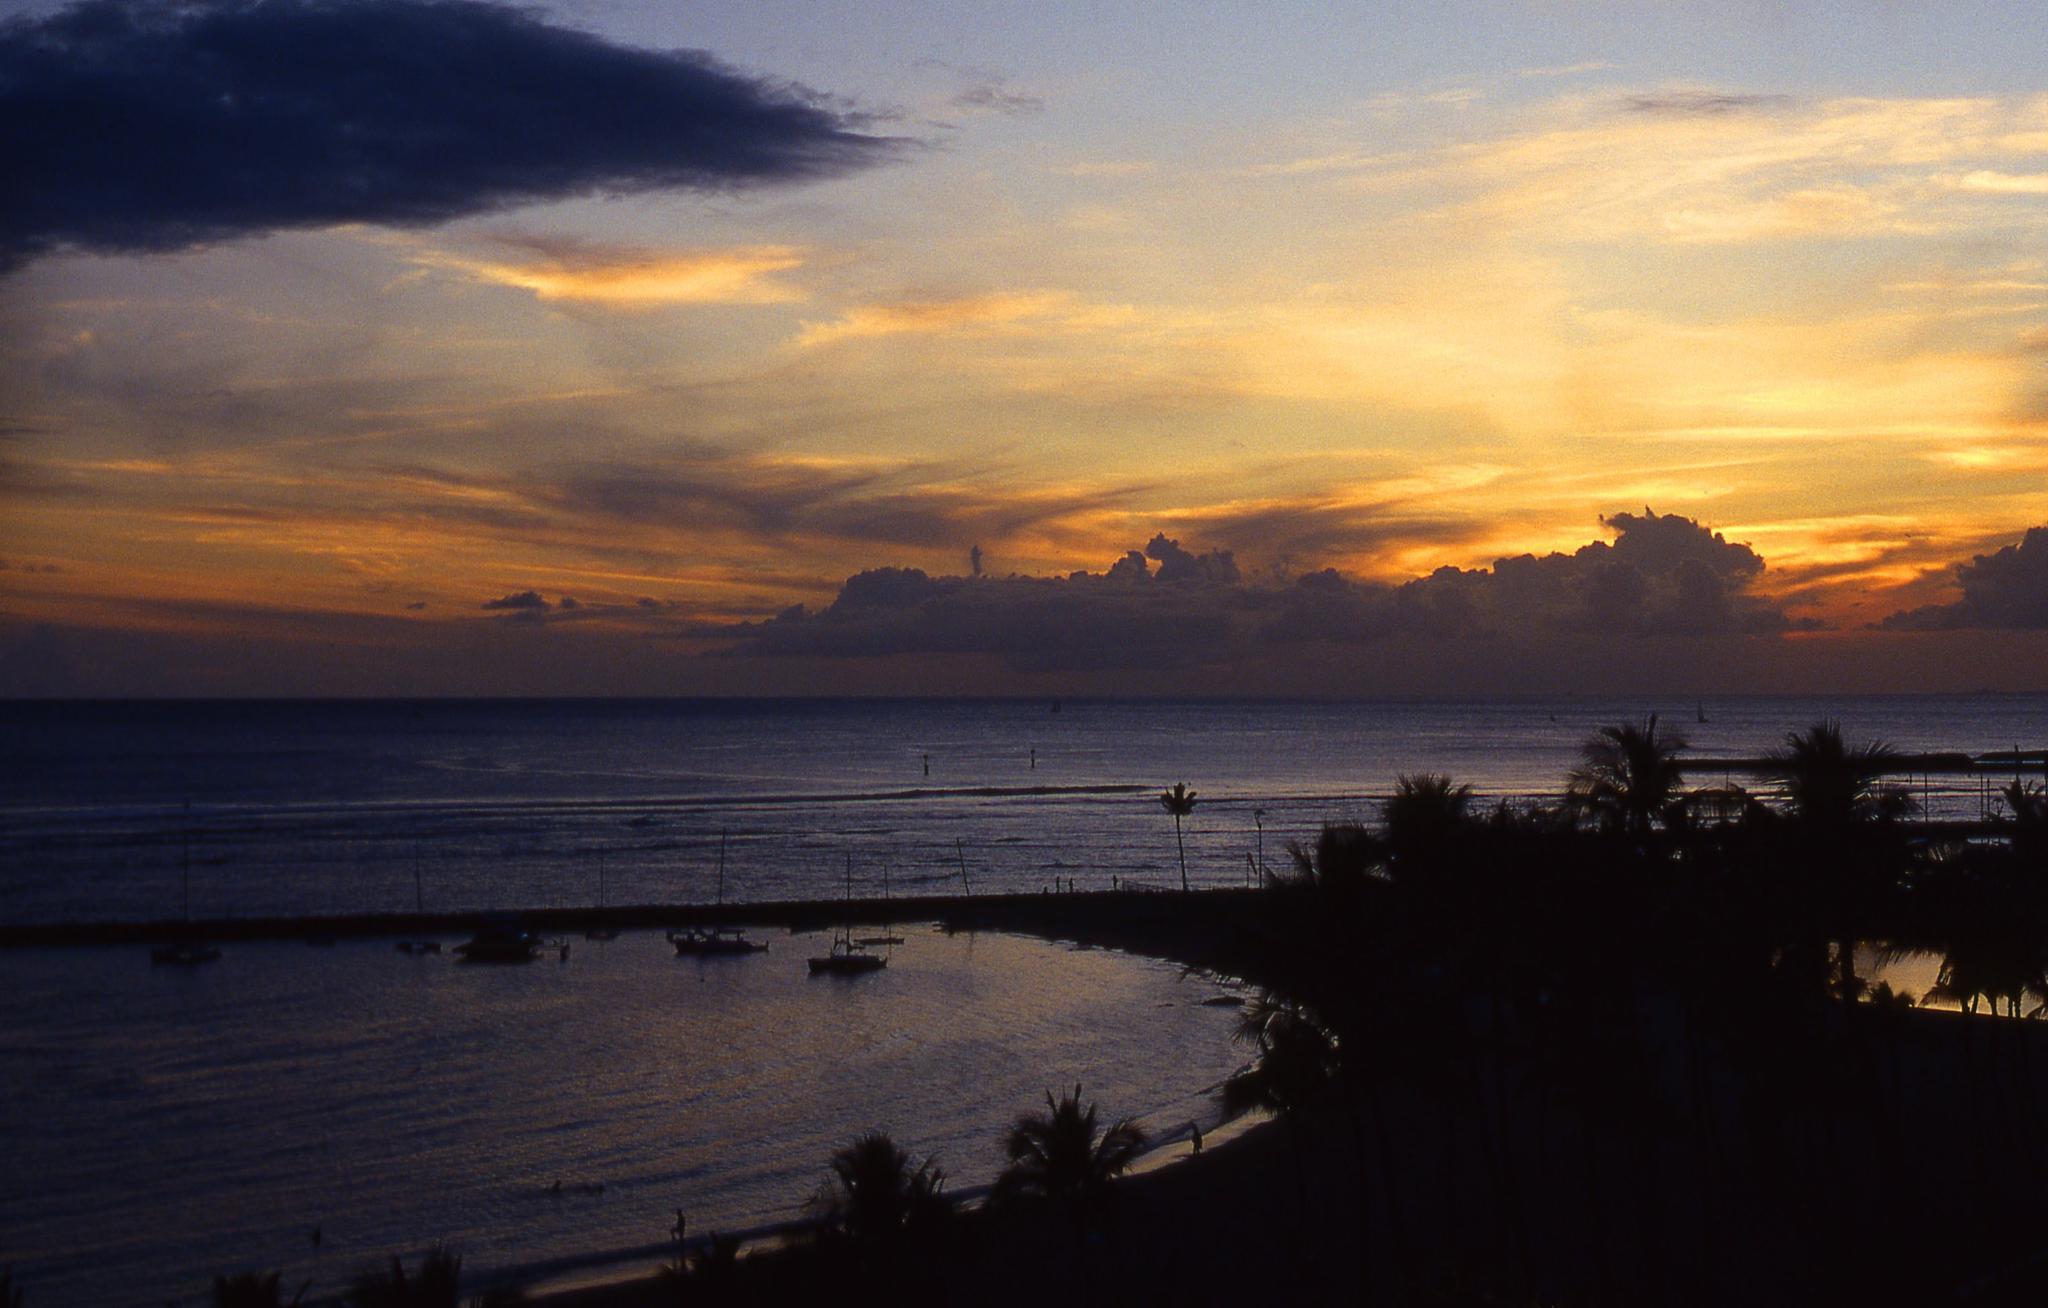 Waikiki by dusk by ninekses